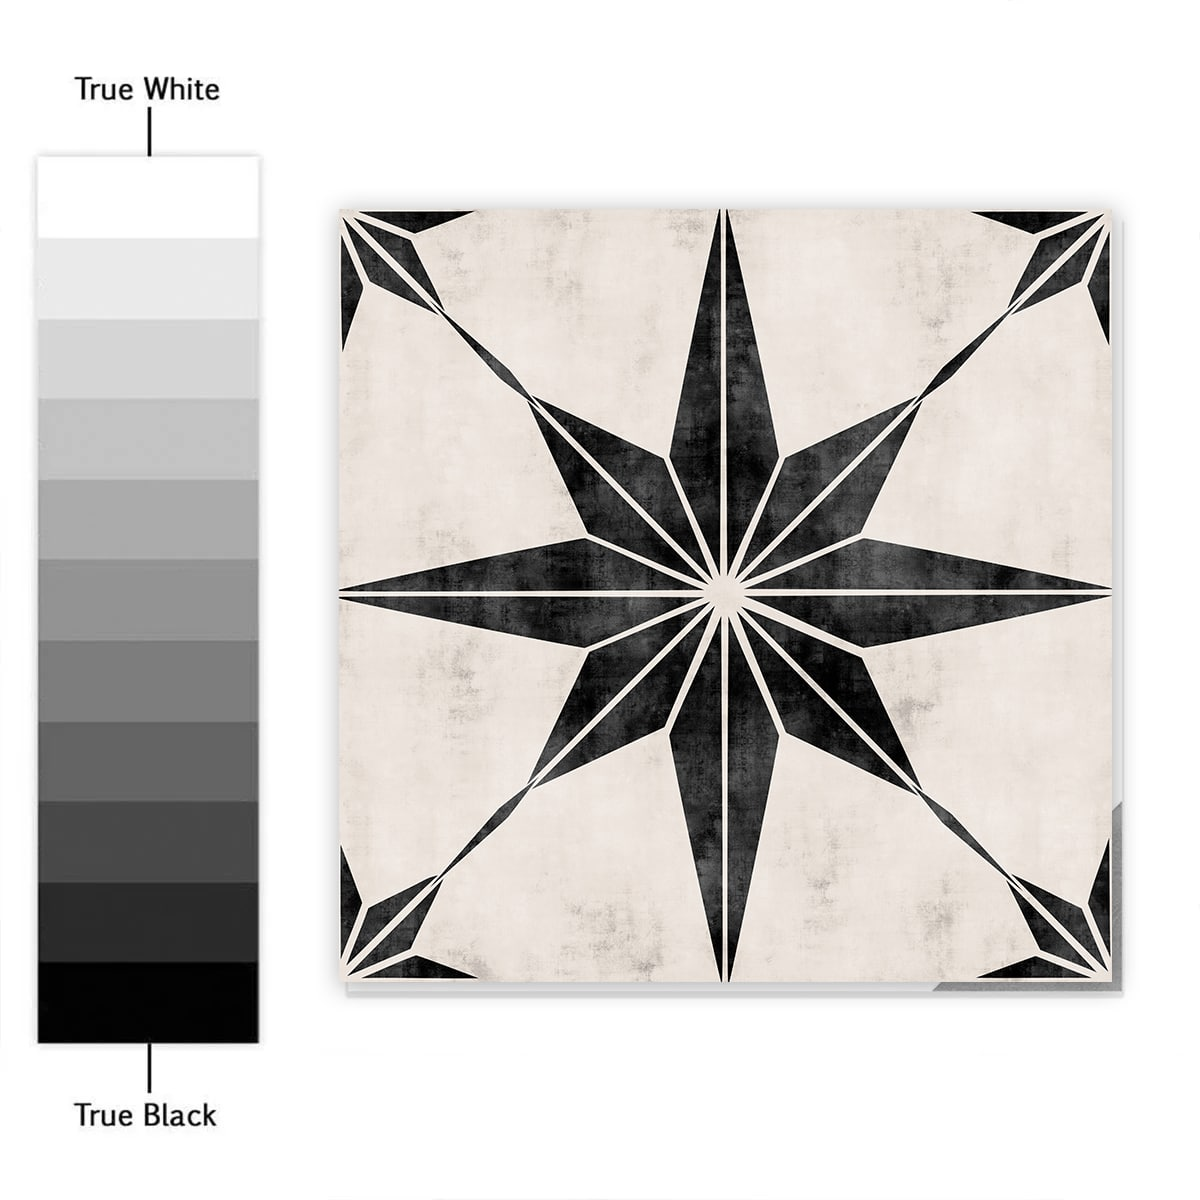 Black Stars Tile Stickers Pack Of 10, Bathroom Tile Decals Uk